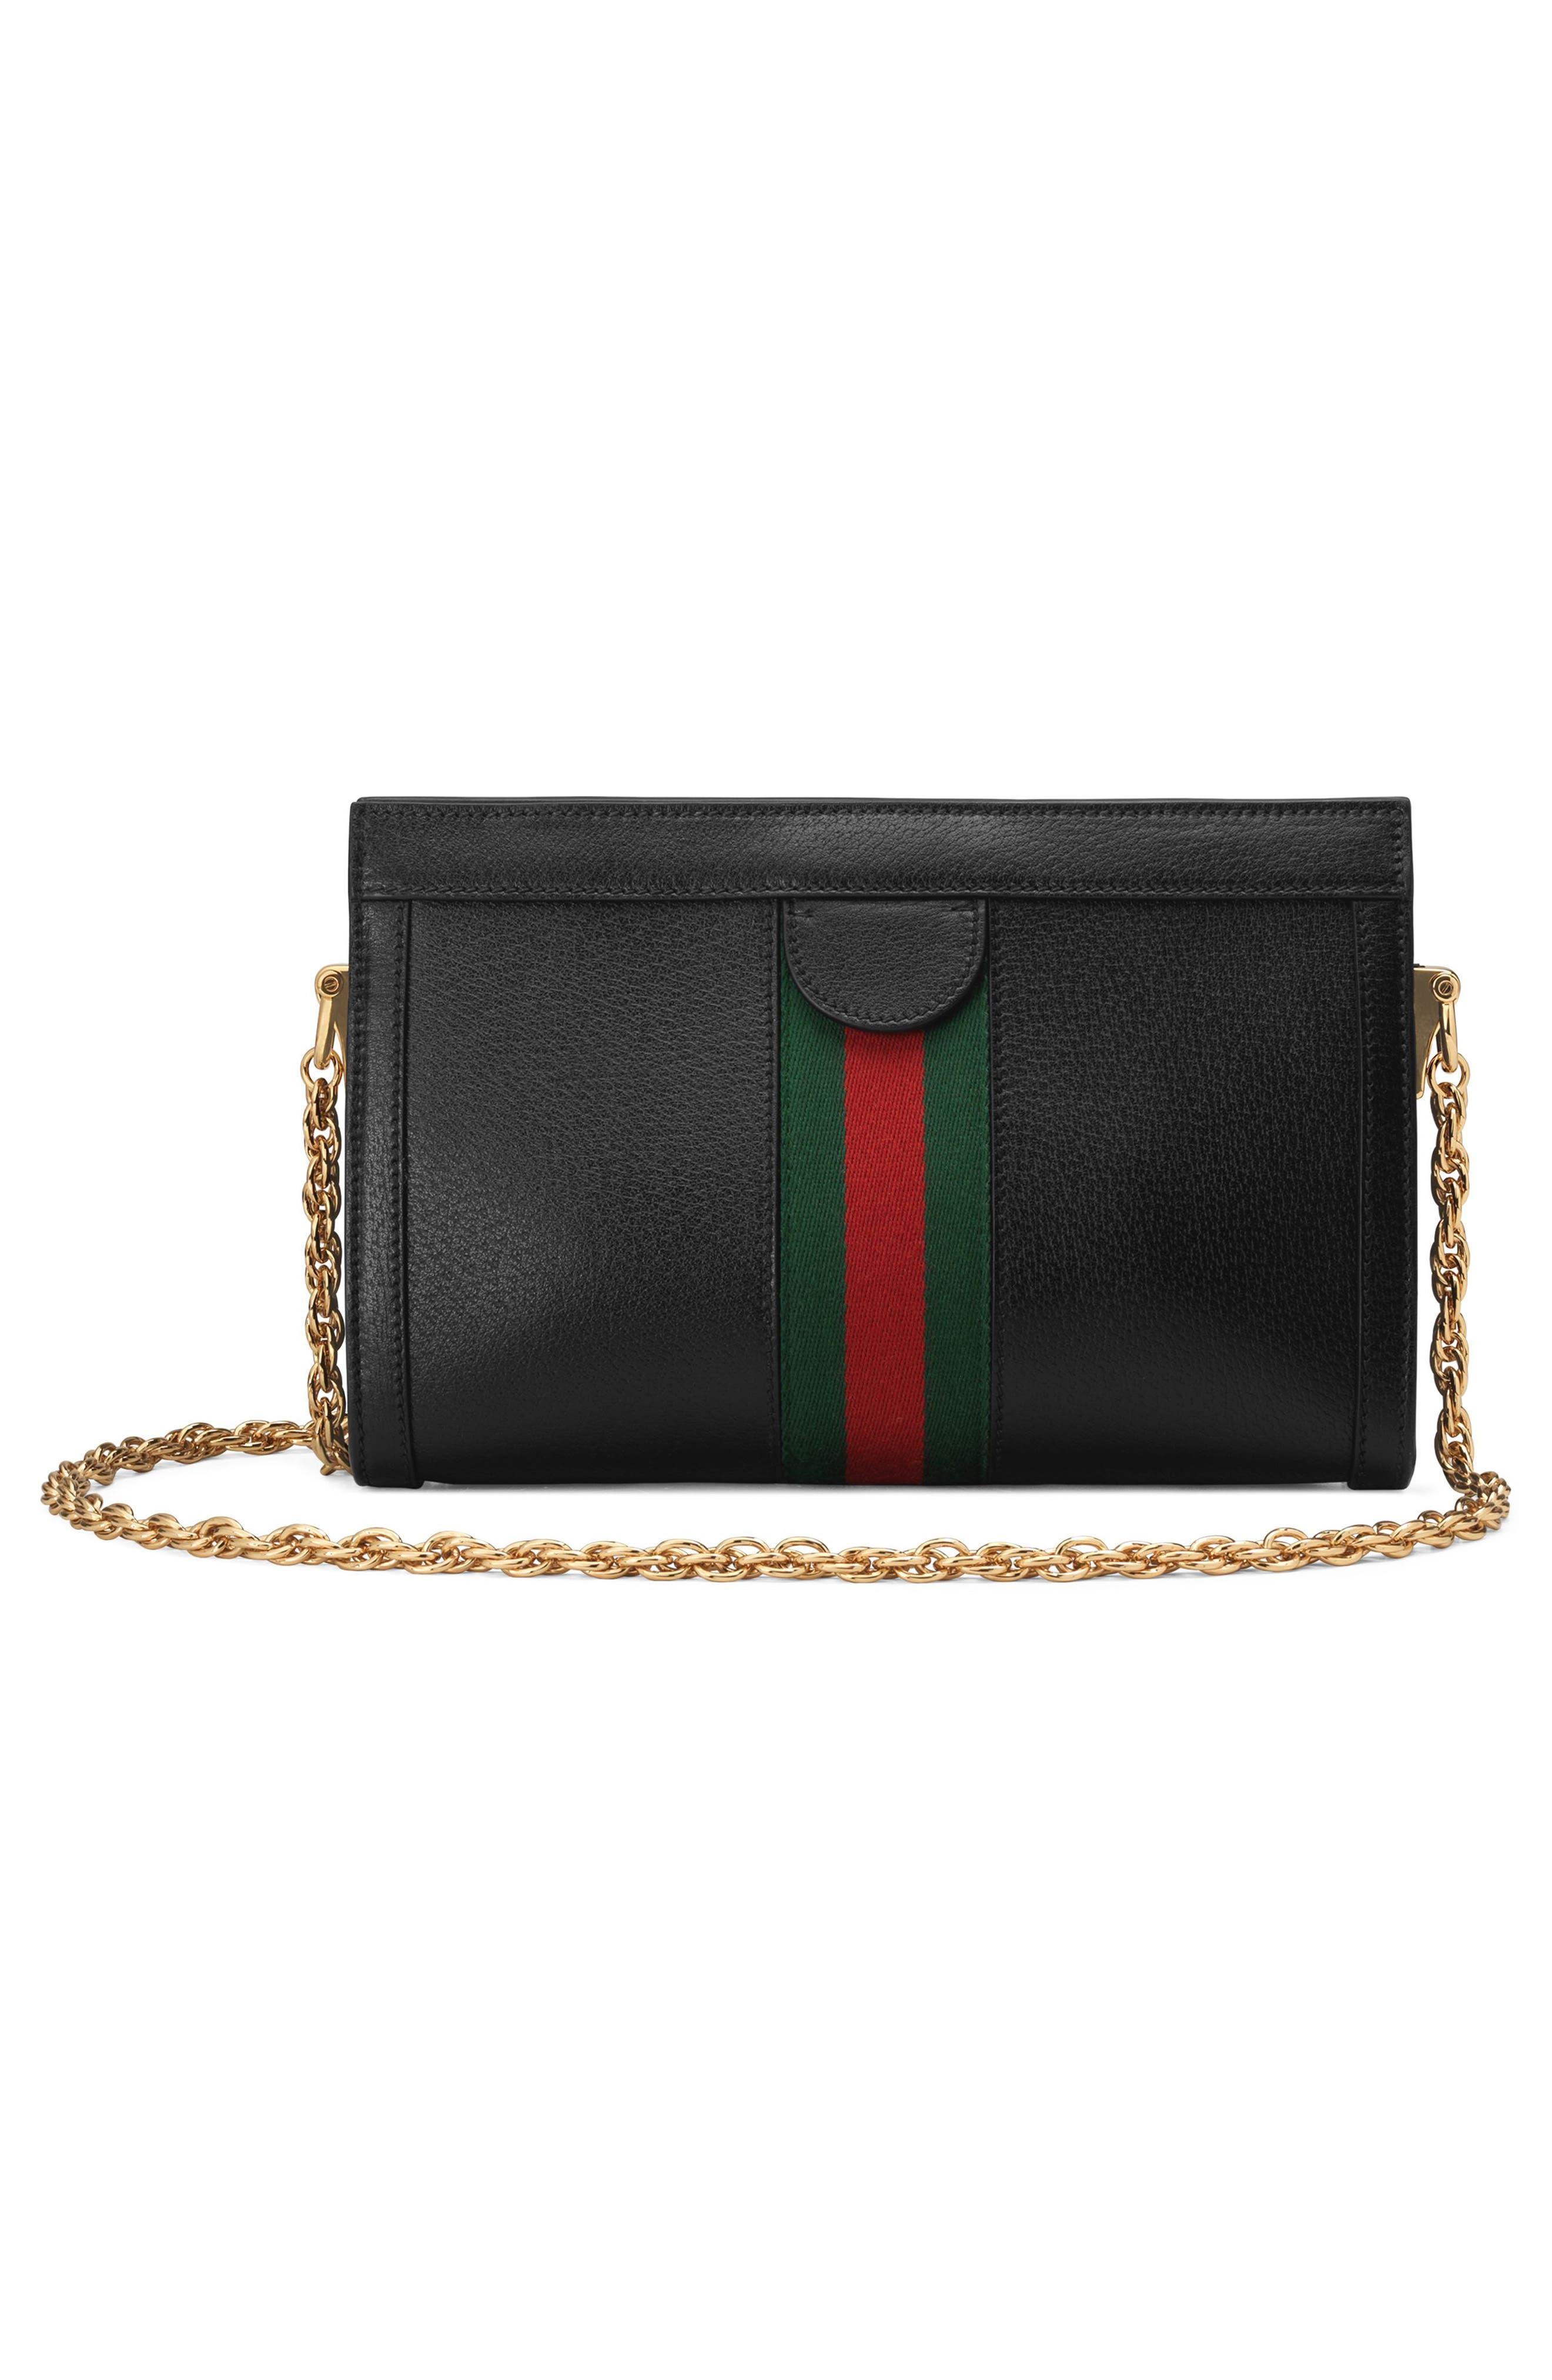 ,                             Small Ophidia Leather Shoulder Bag,                             Alternate thumbnail 2, color,                             NERO/ VERT RED VERT